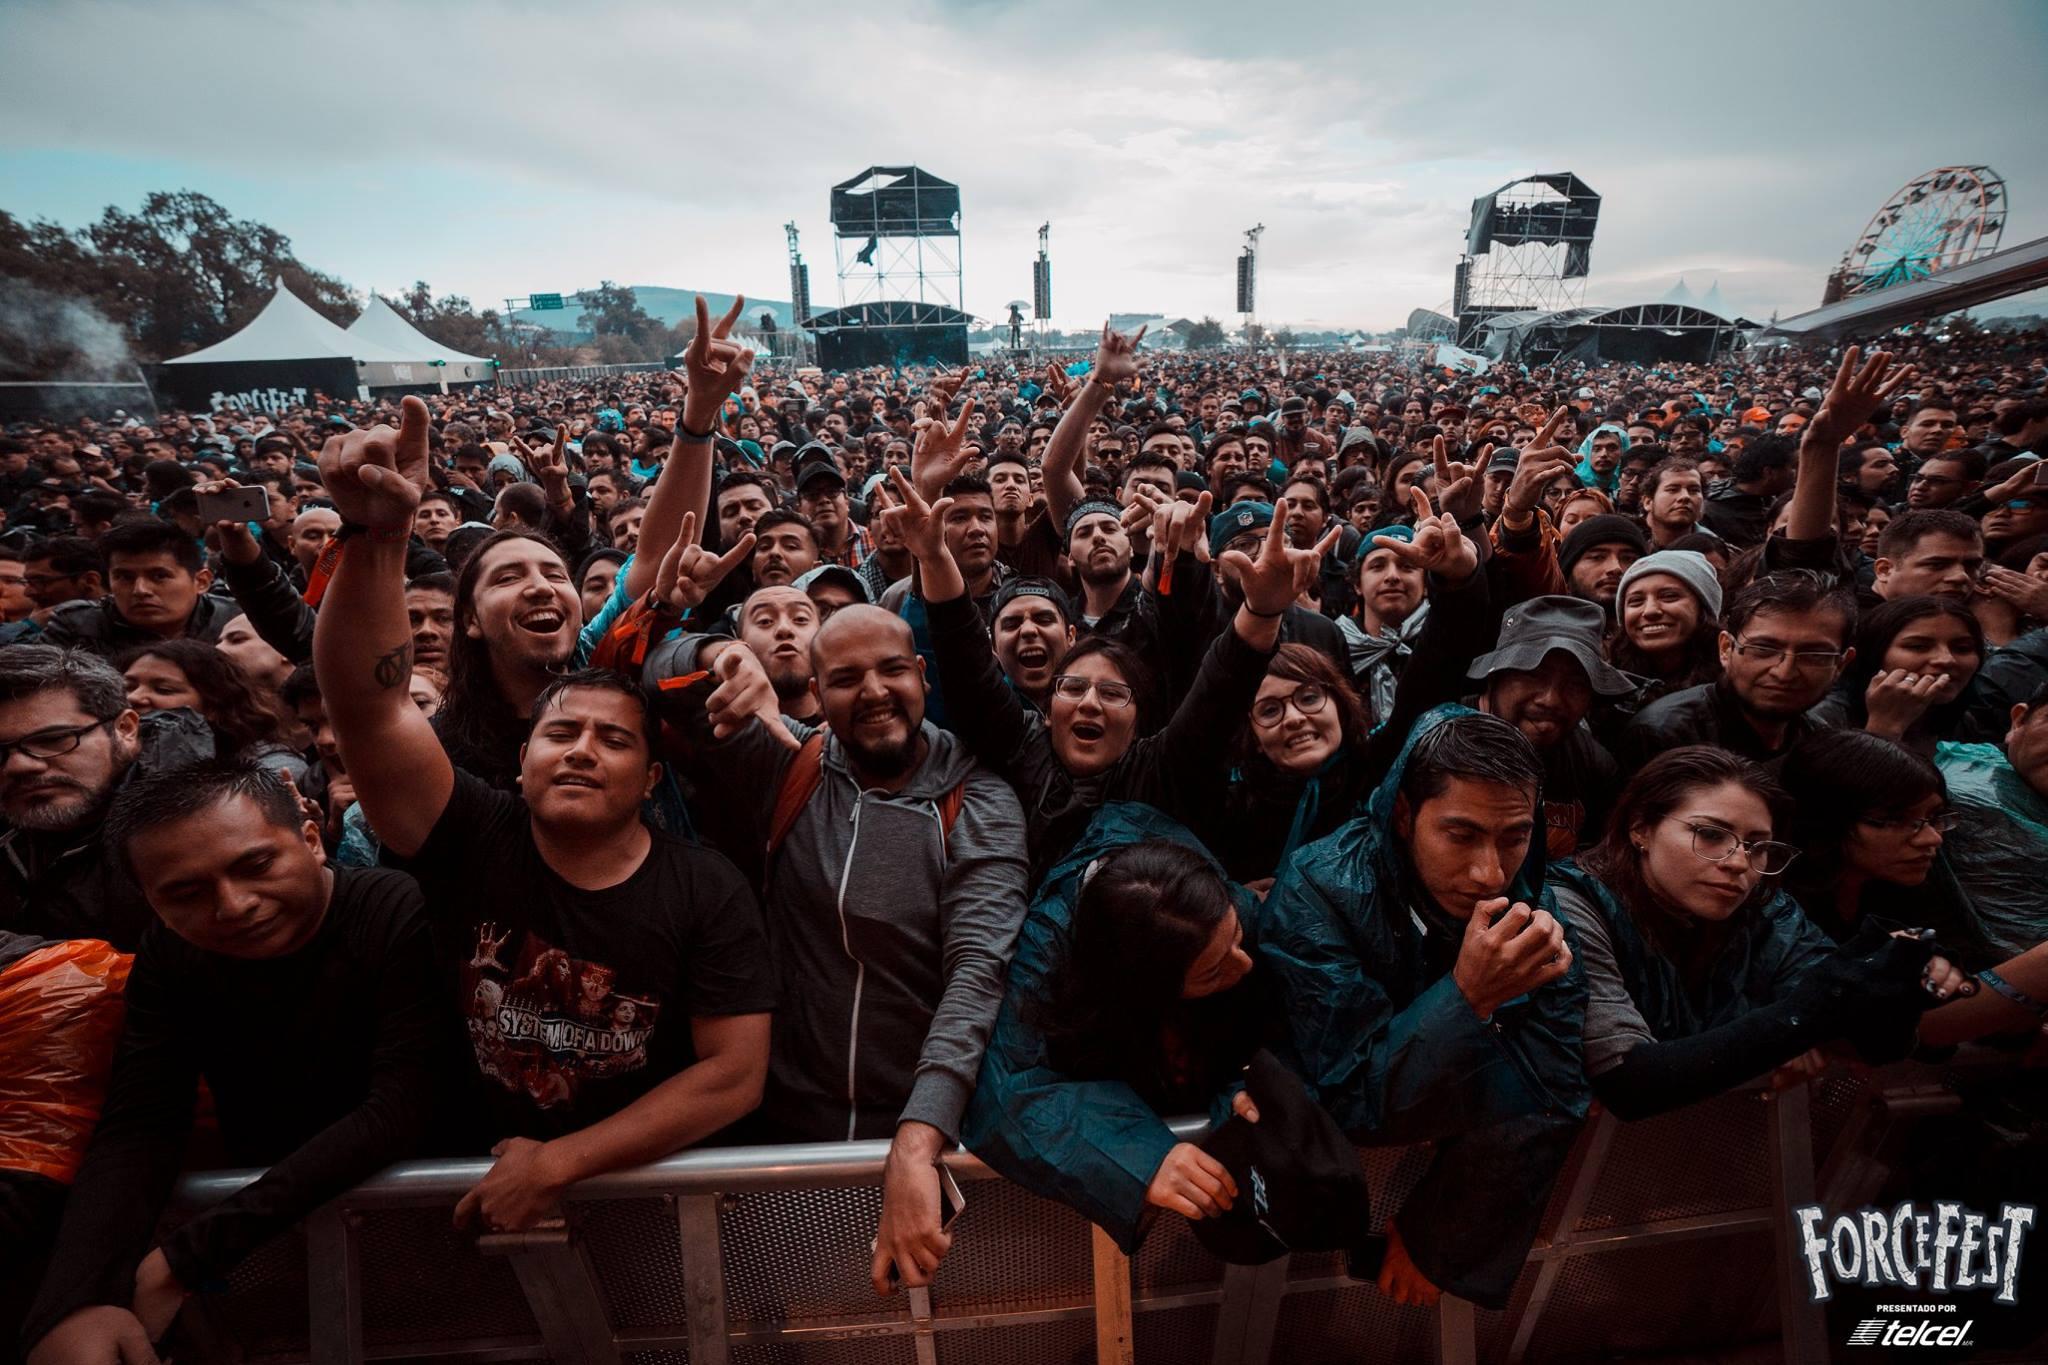 Force Fest 2018 nuestra opinión